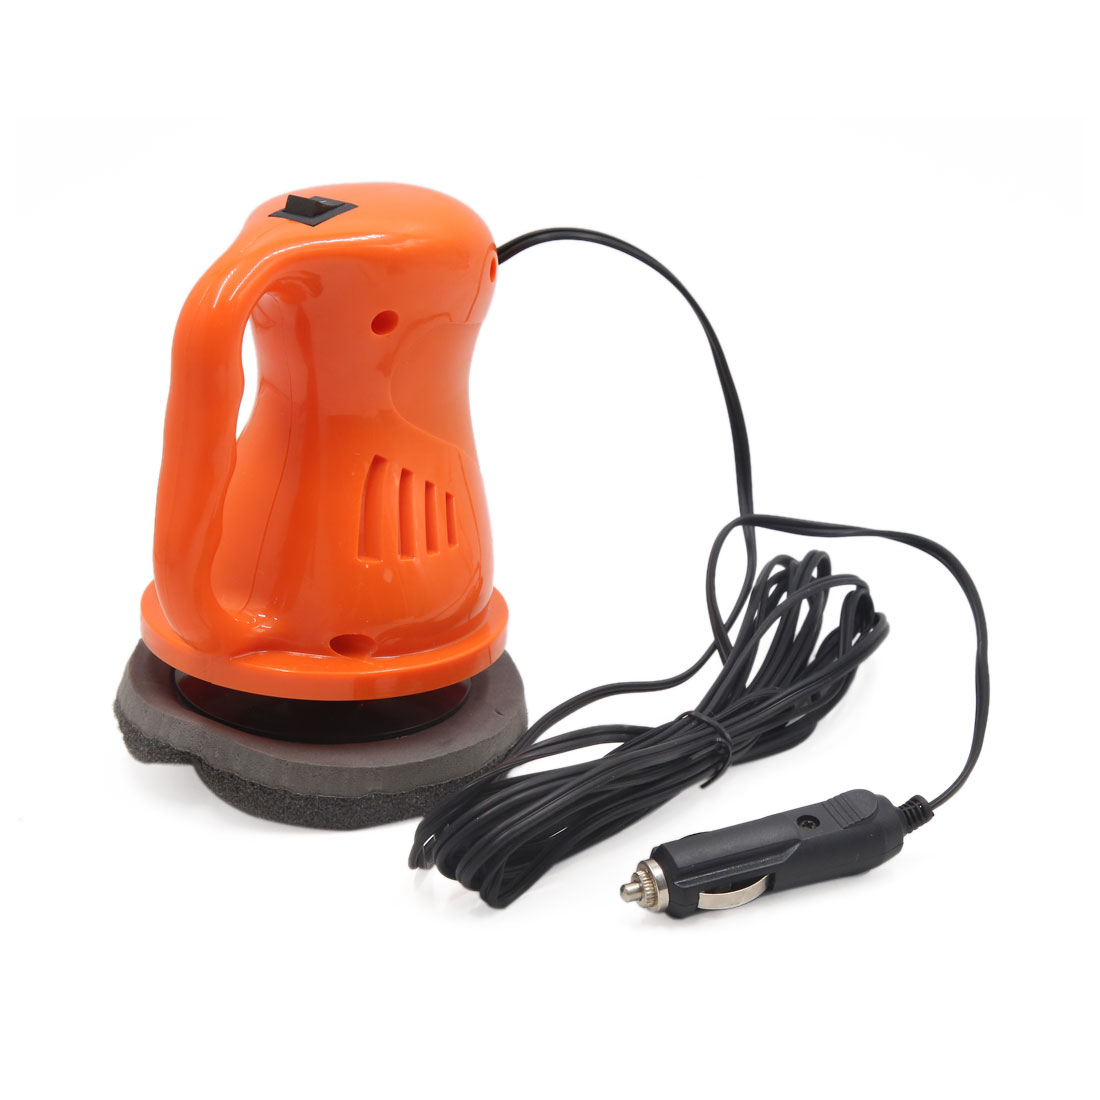 "4.7/"" Electric Car Truck Polisher Waxer Buffer Sander Home Machine Orange"